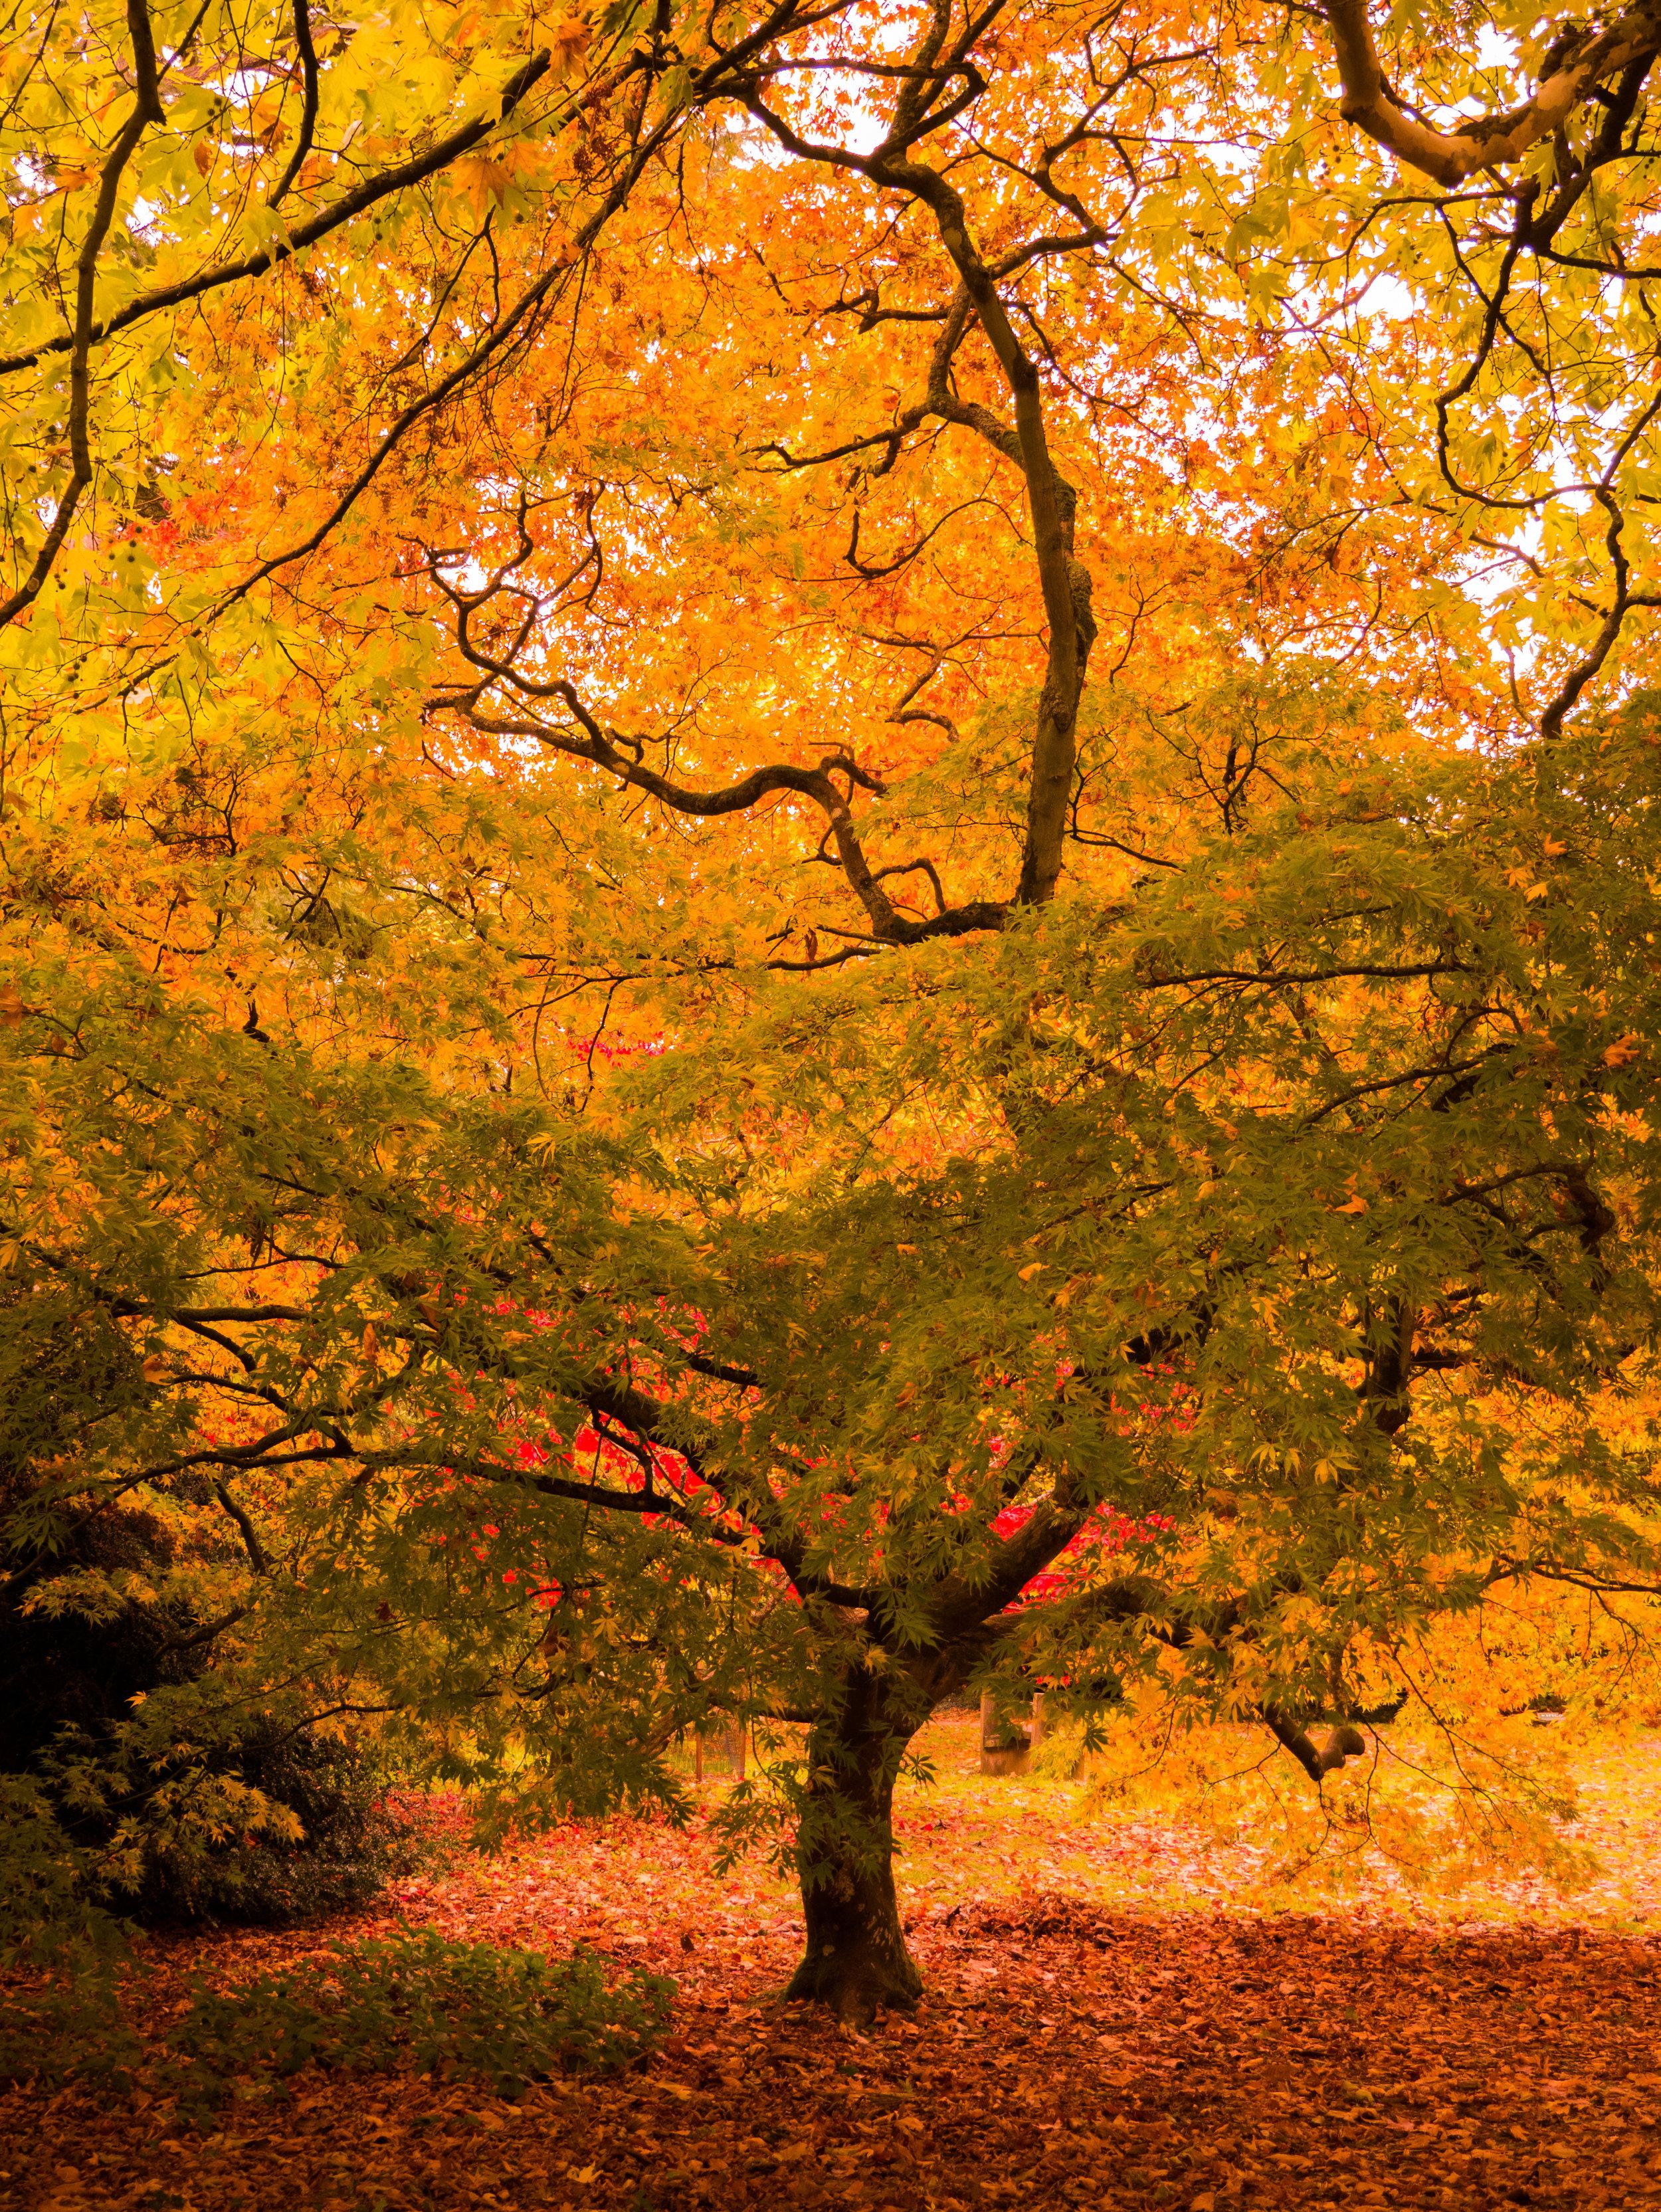 Amazing fall colors.